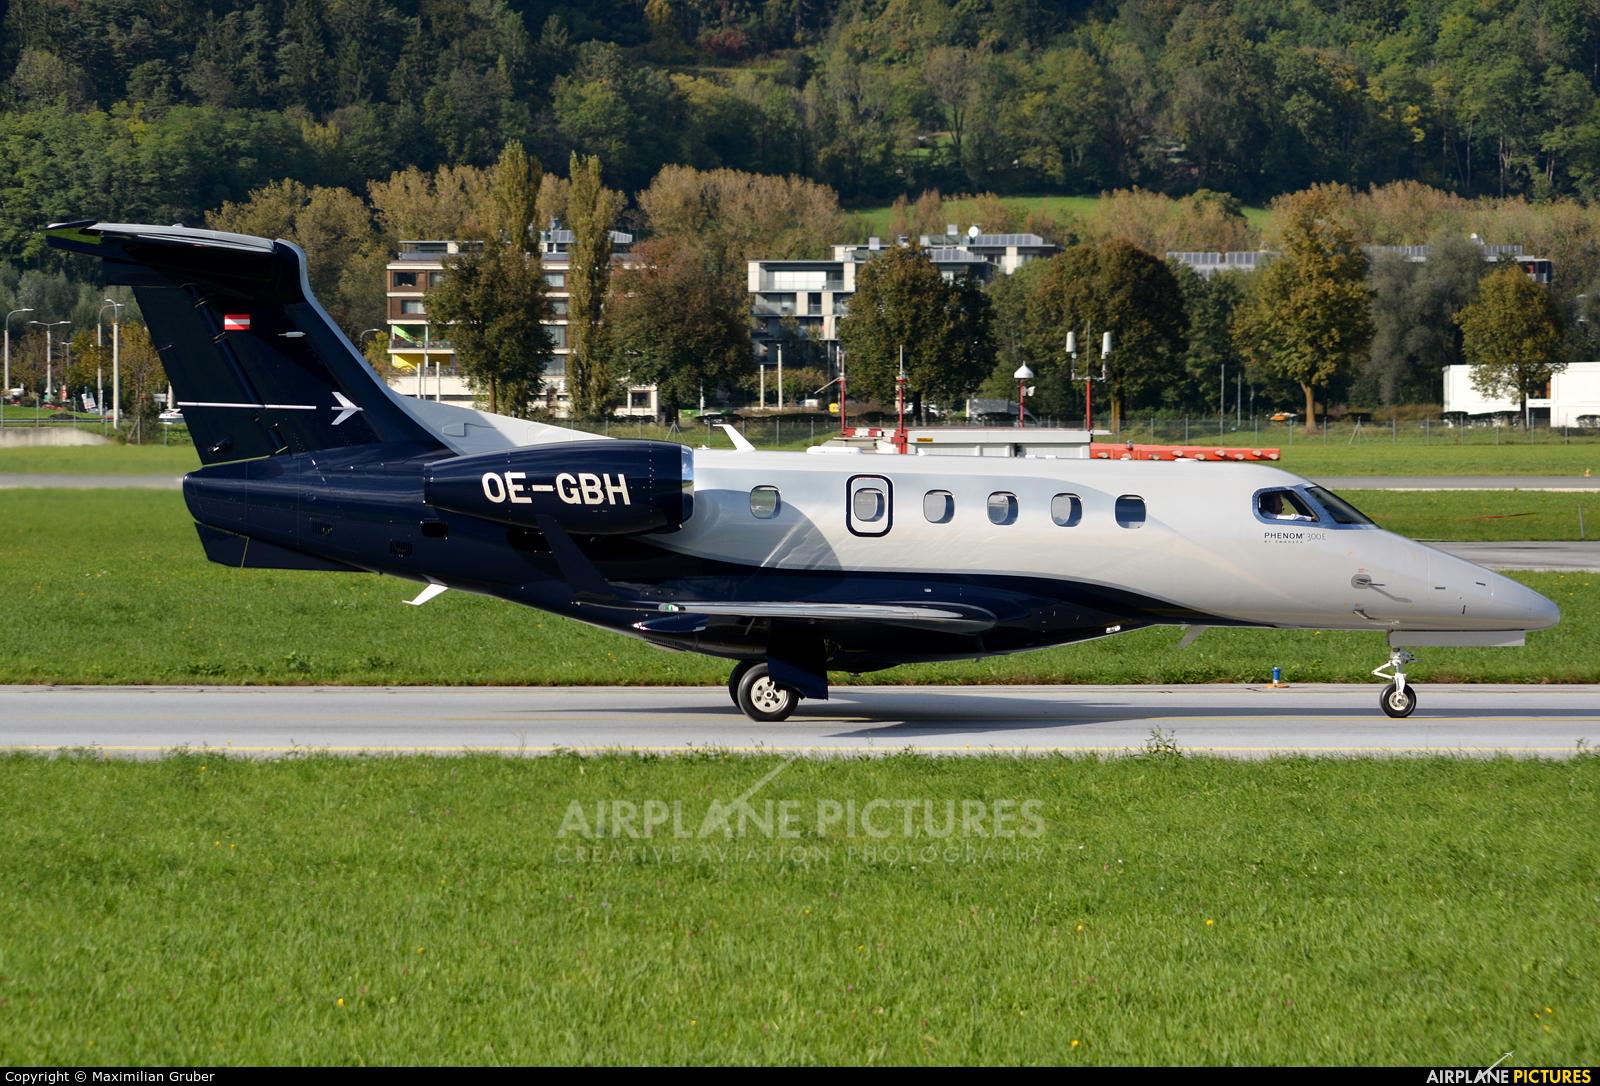 Tyrolean Jet Service OE-GBH aircraft at Innsbruck